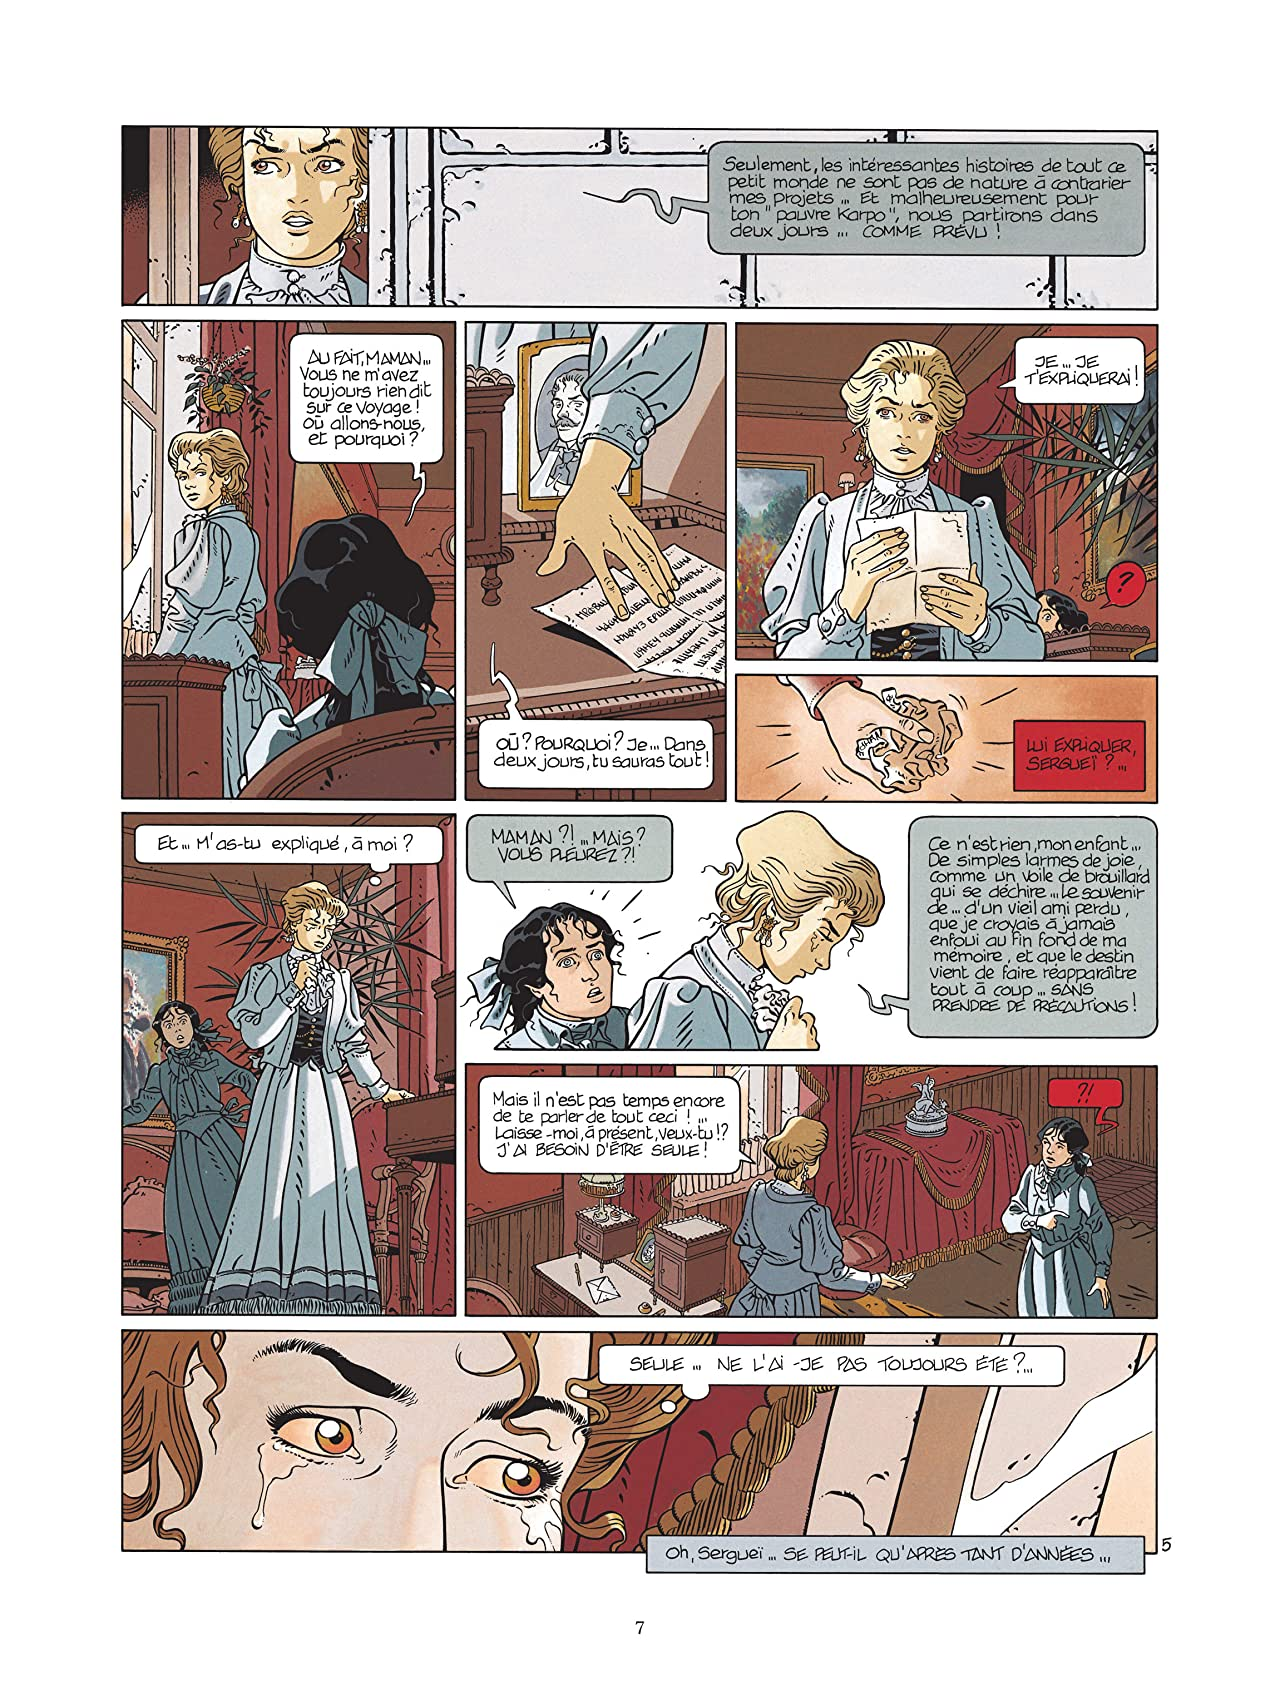 Sophaletta Vol. 1: Des larmes de sang